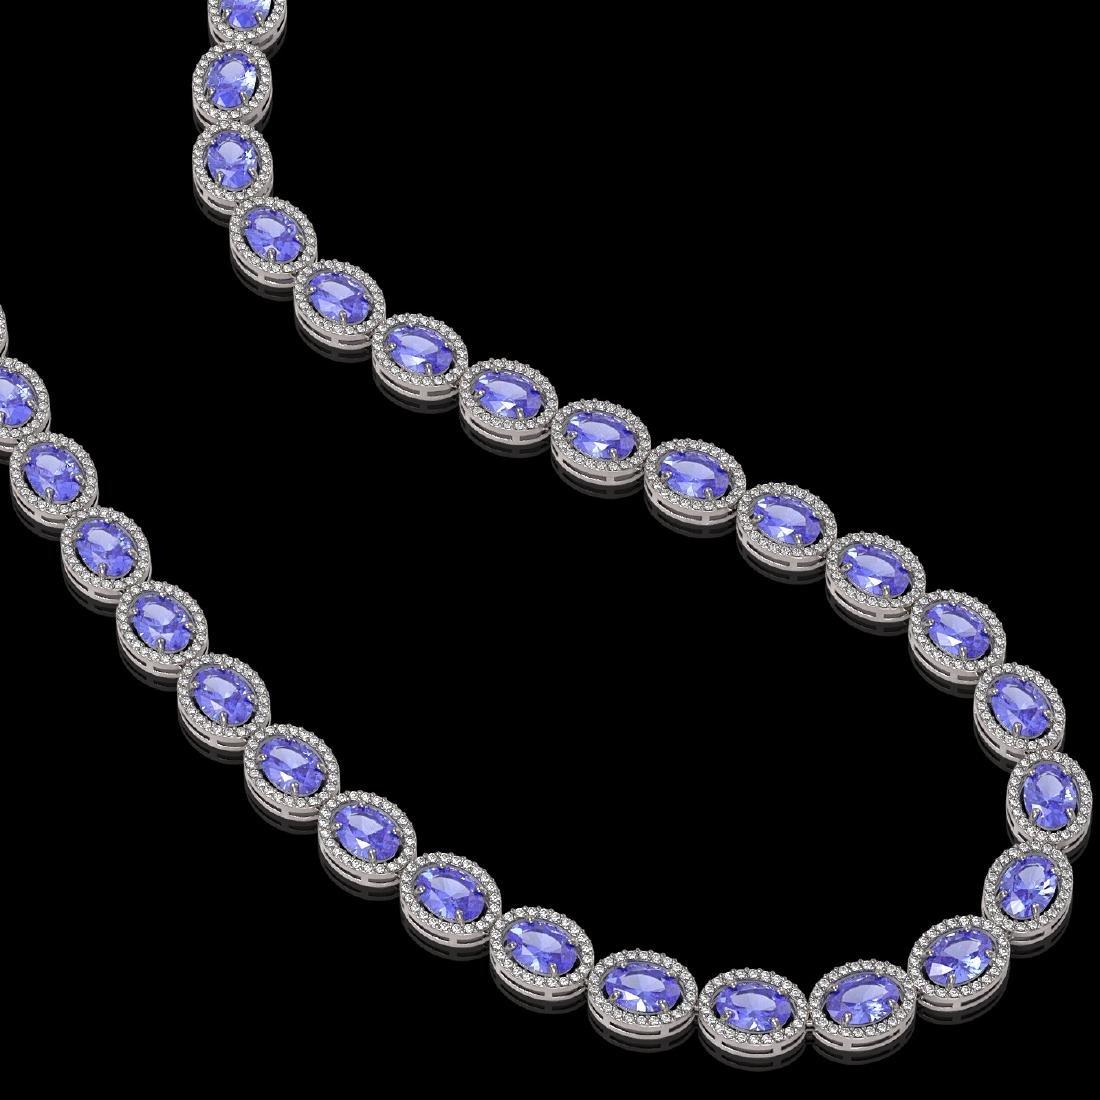 48.65 CTW Tanzanite & Diamond Halo Necklace 10K White - 2